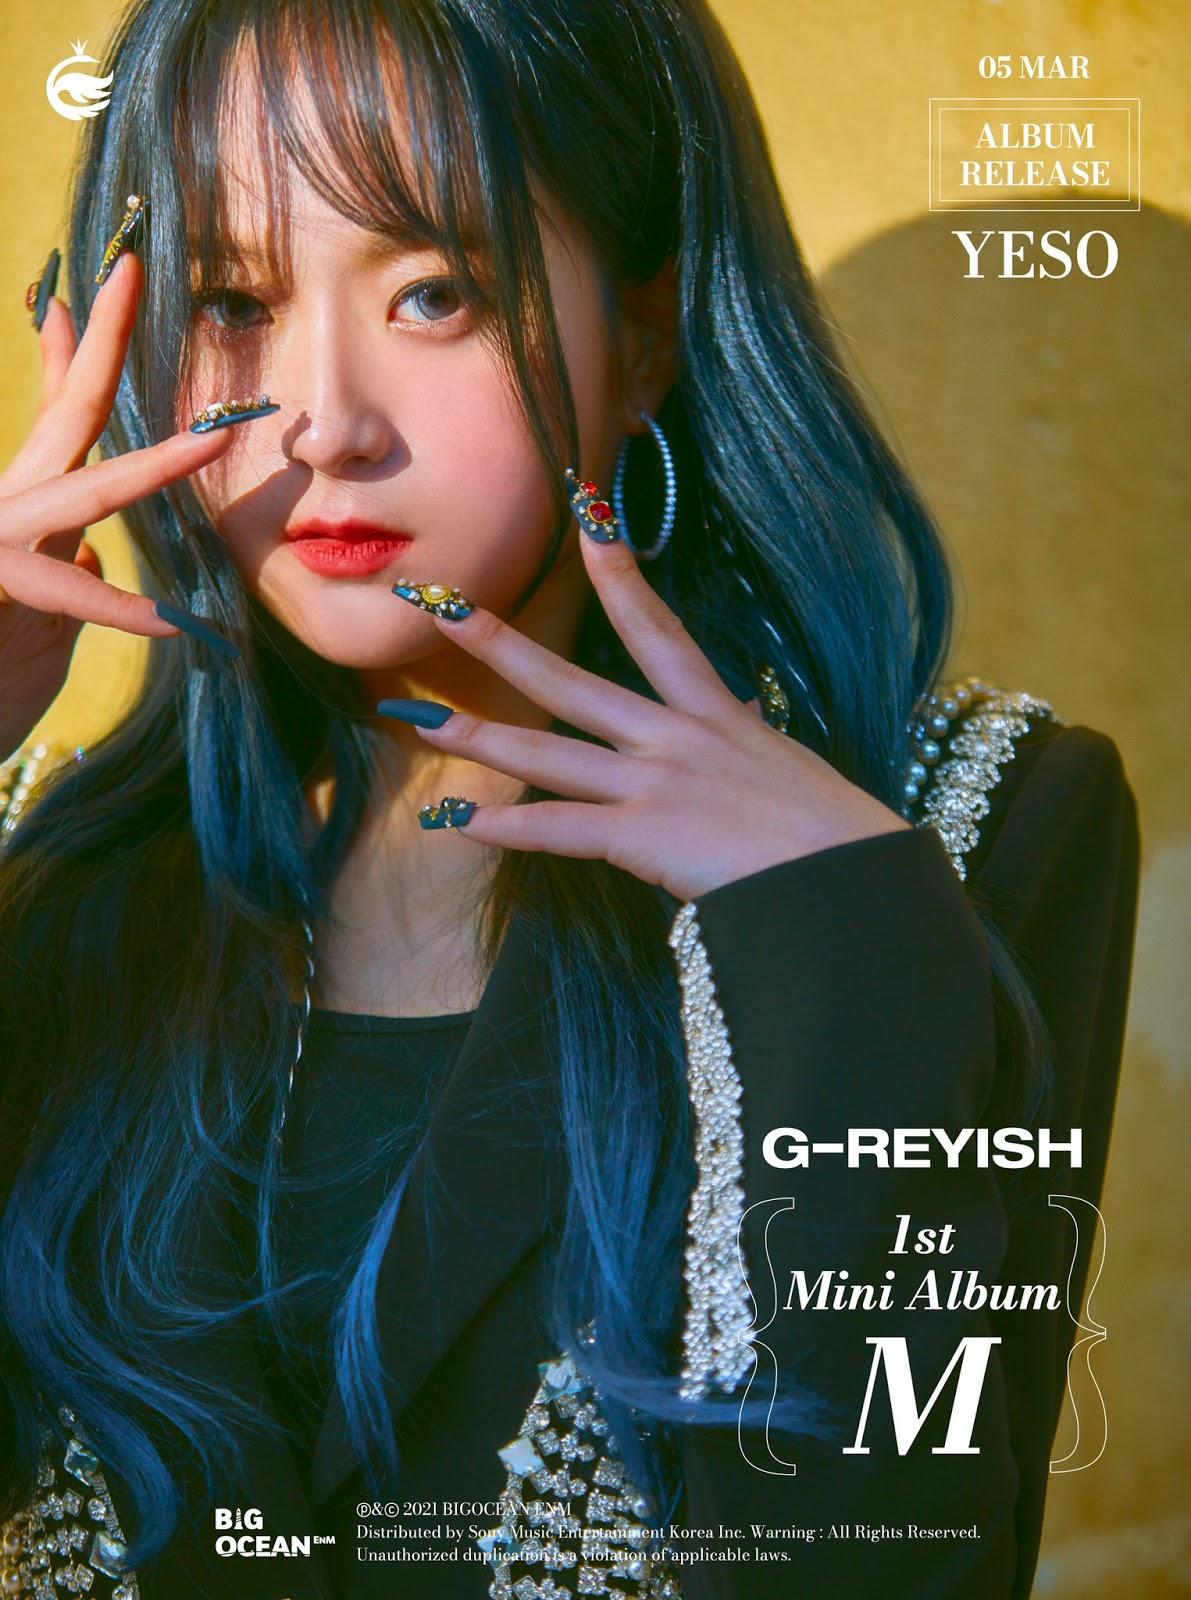 g-reyish m comeback yeso